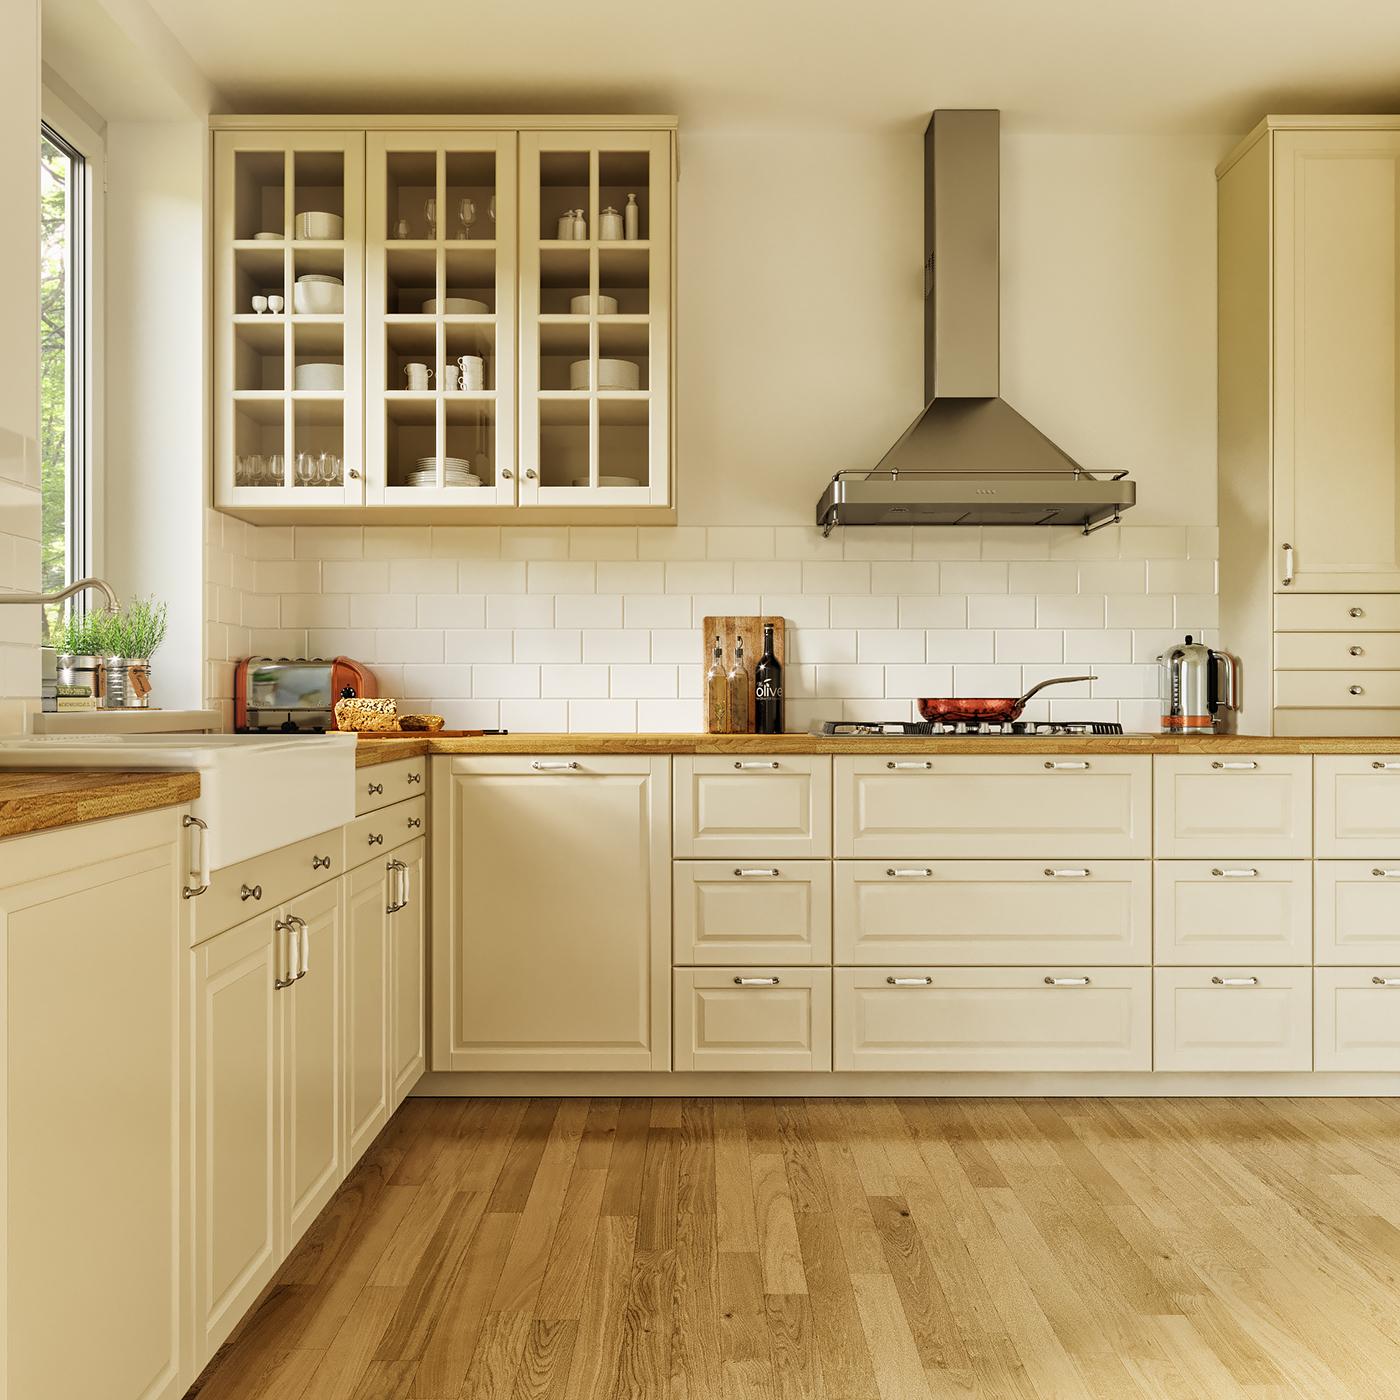 Ikea Kitchen Design Software Free: Ikea Bodbyn Kitchen